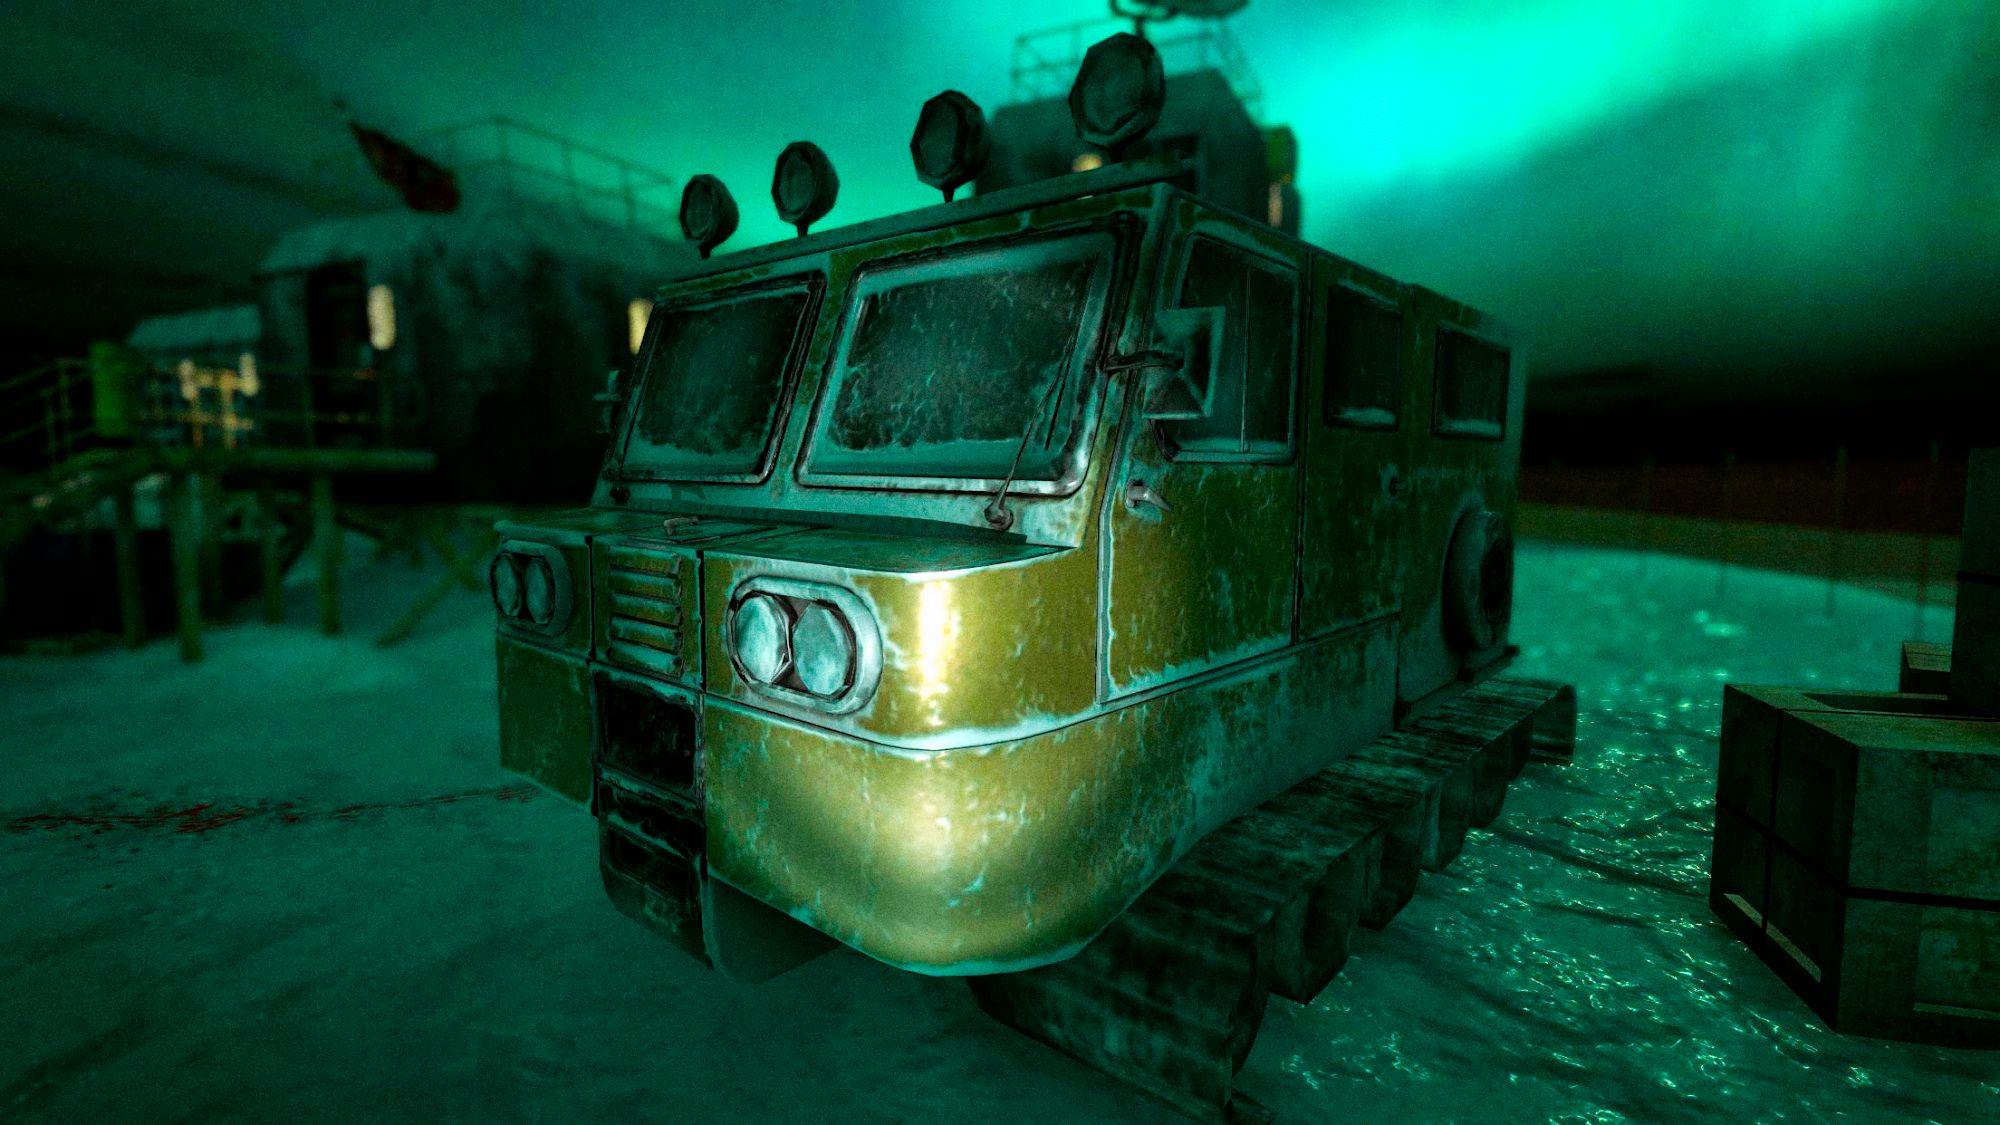 Antarctica 88: Scary Action Survival Horror Game screenshot 1